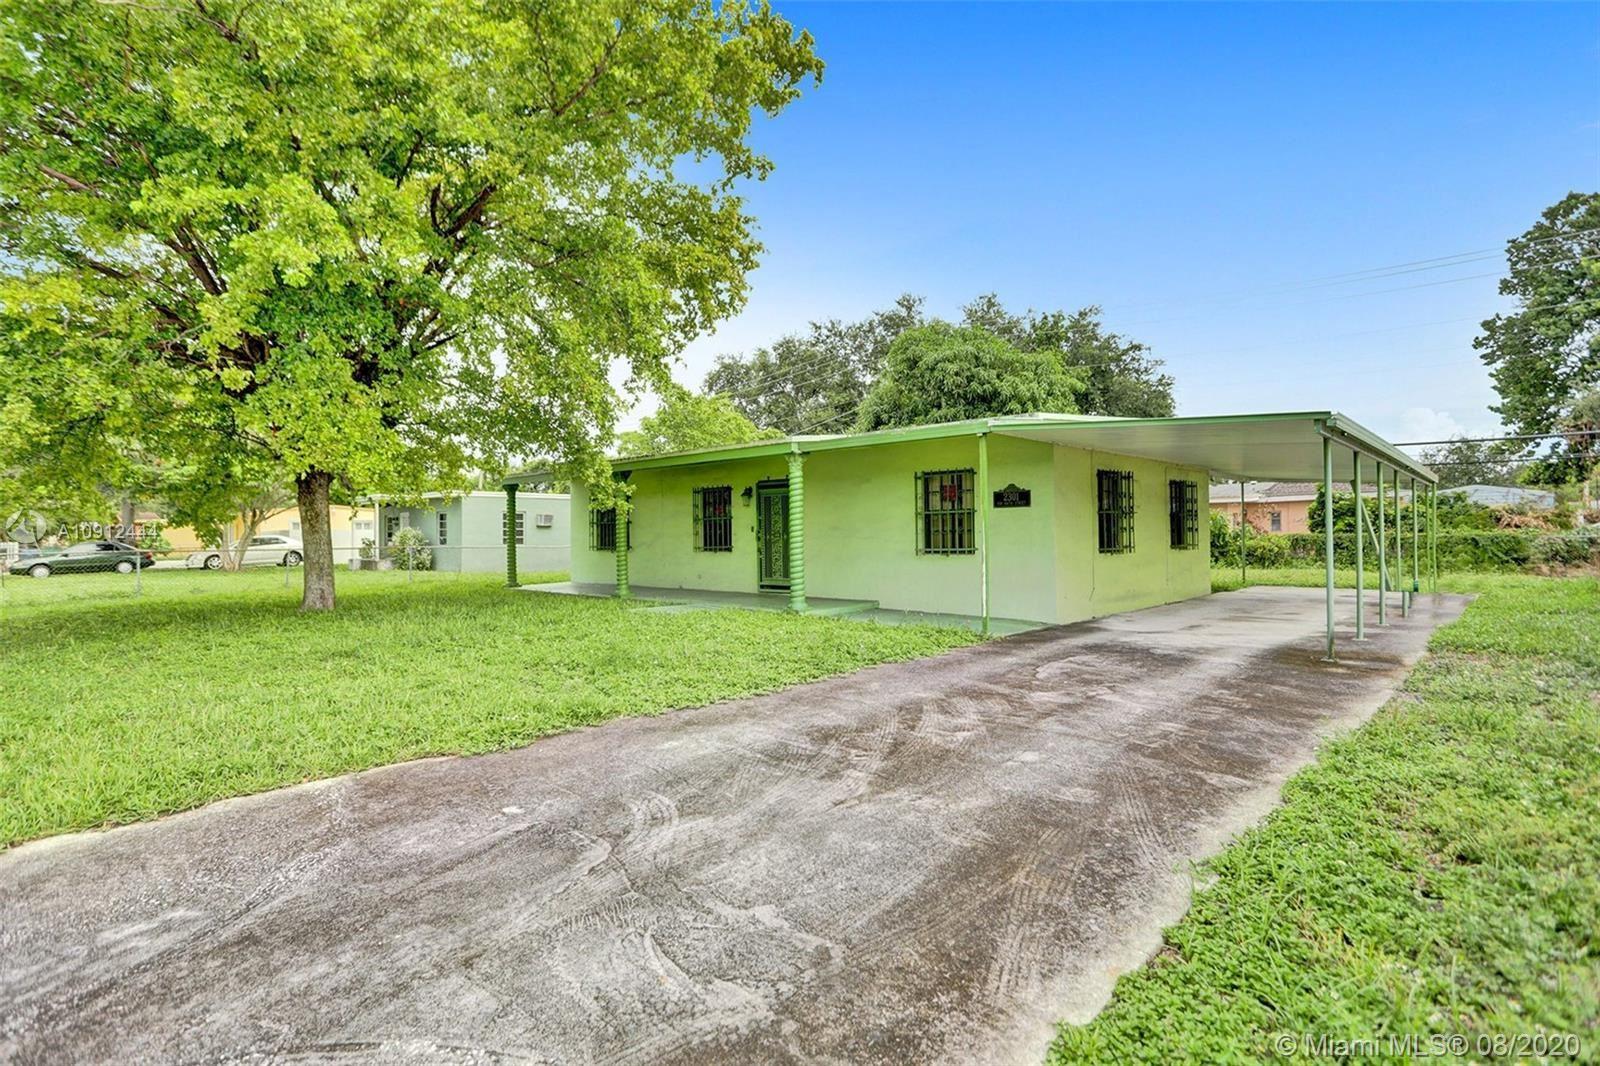 2301 NW 166th St, Miami Gardens, FL 33054 - #: A10912444